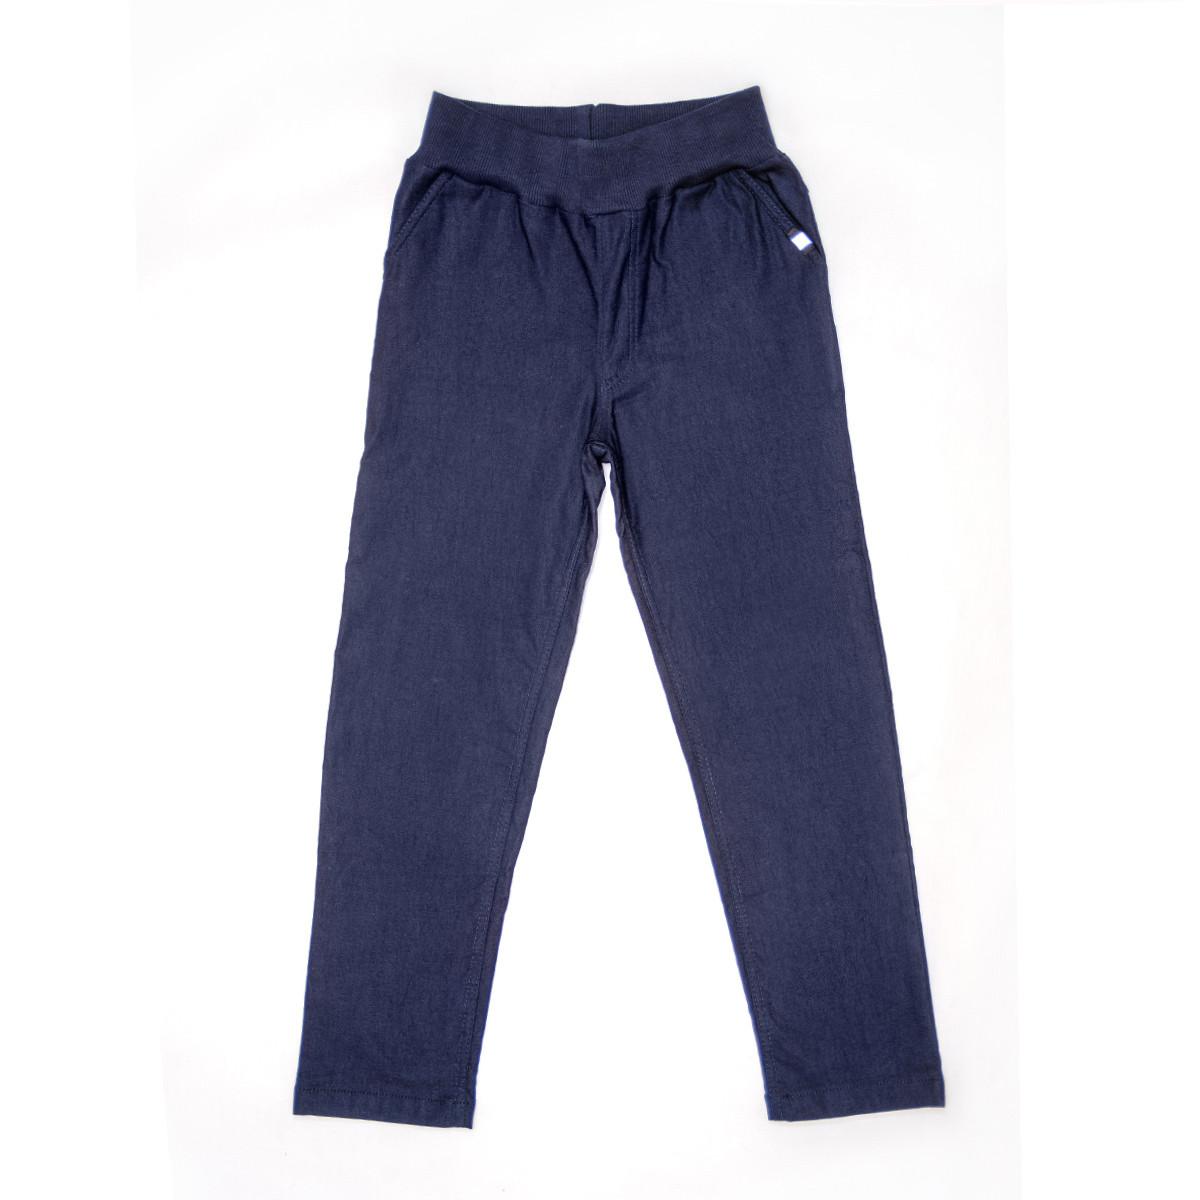 Брюки для мальчика на флисе р.152,158 SmileTime утепленные Warm Fashion, джинс